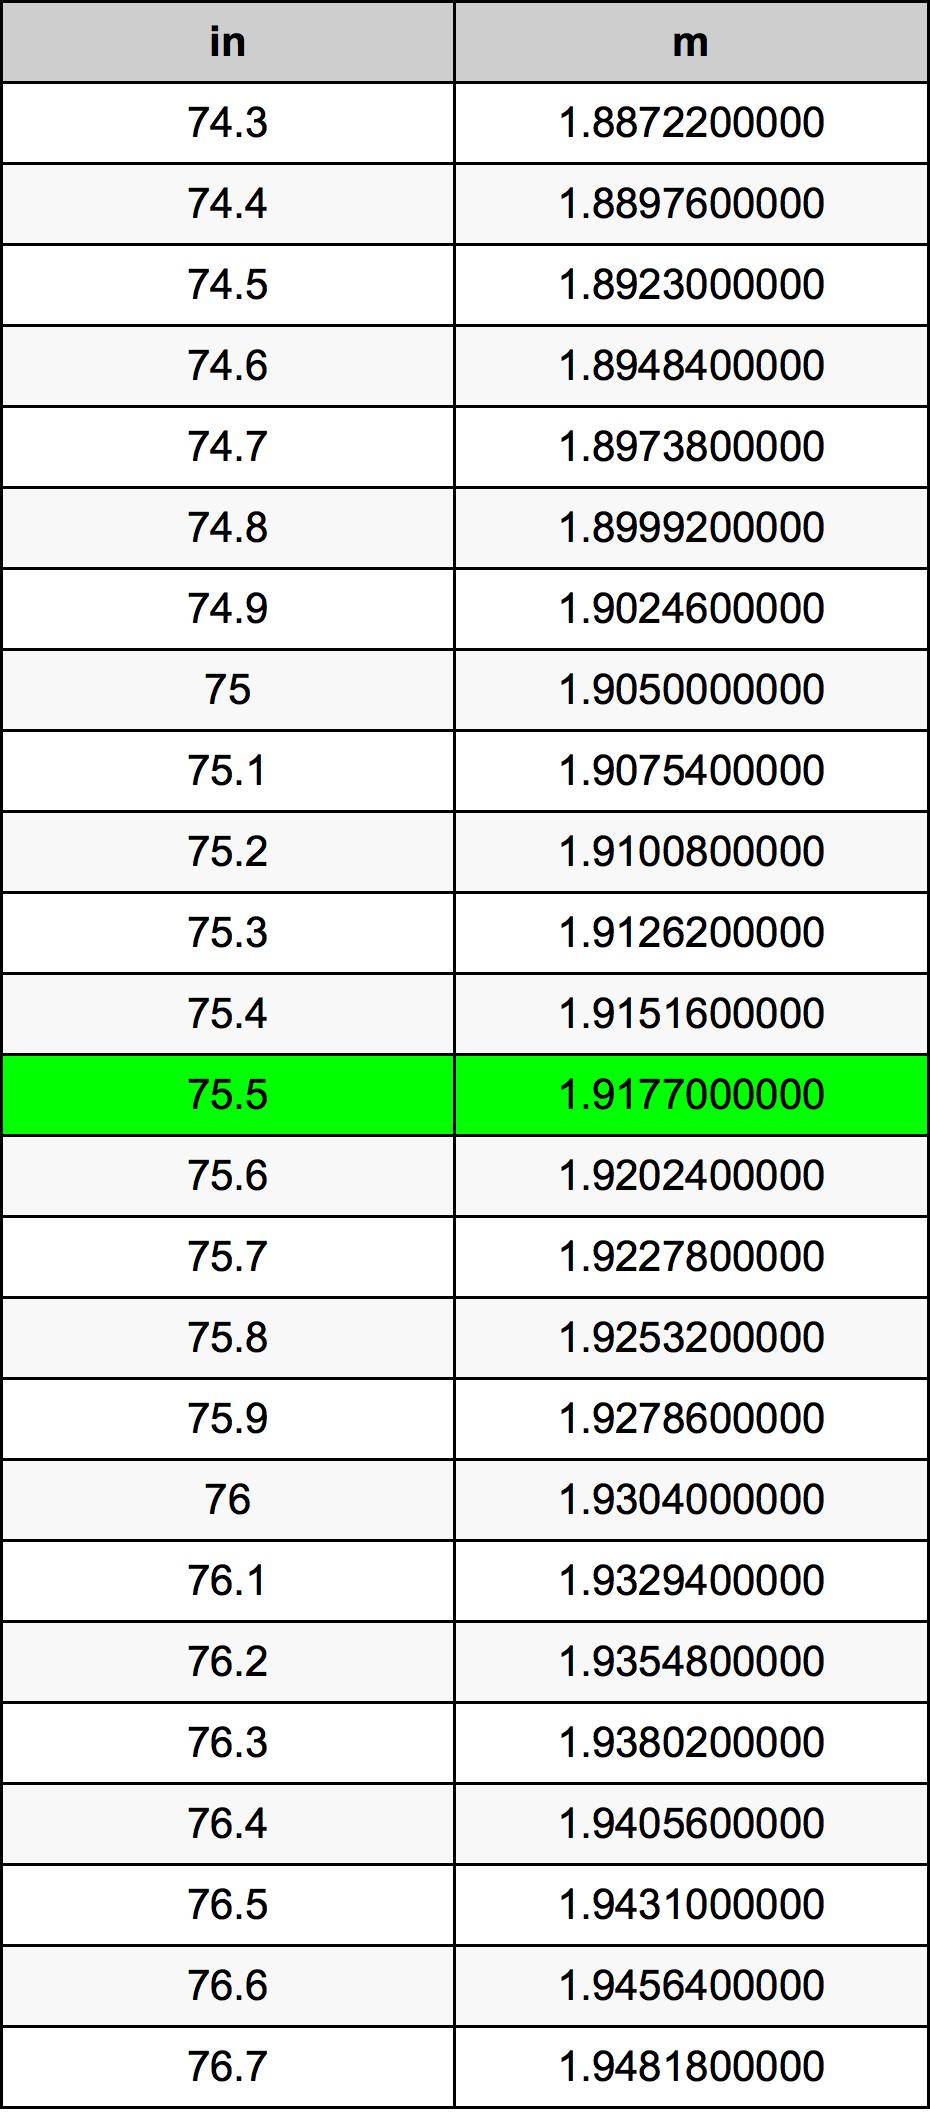 75.5 дюйм Таблица преобразования